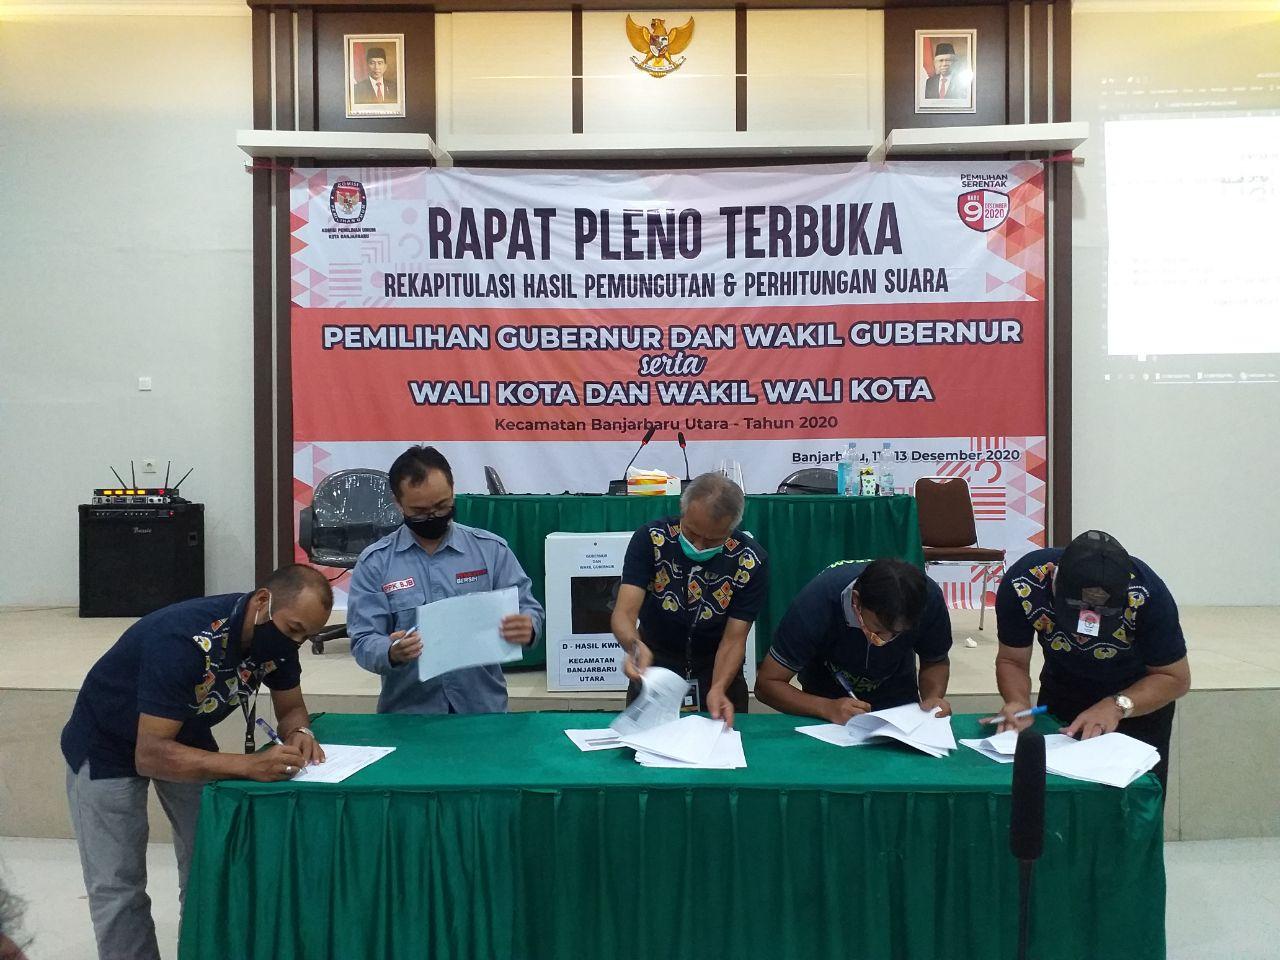 Rapat Pleno Terbuka Rekapitulasi Hasil Penghitungan Suara Kecamatan Banjarbaru Utara Tahun 2020